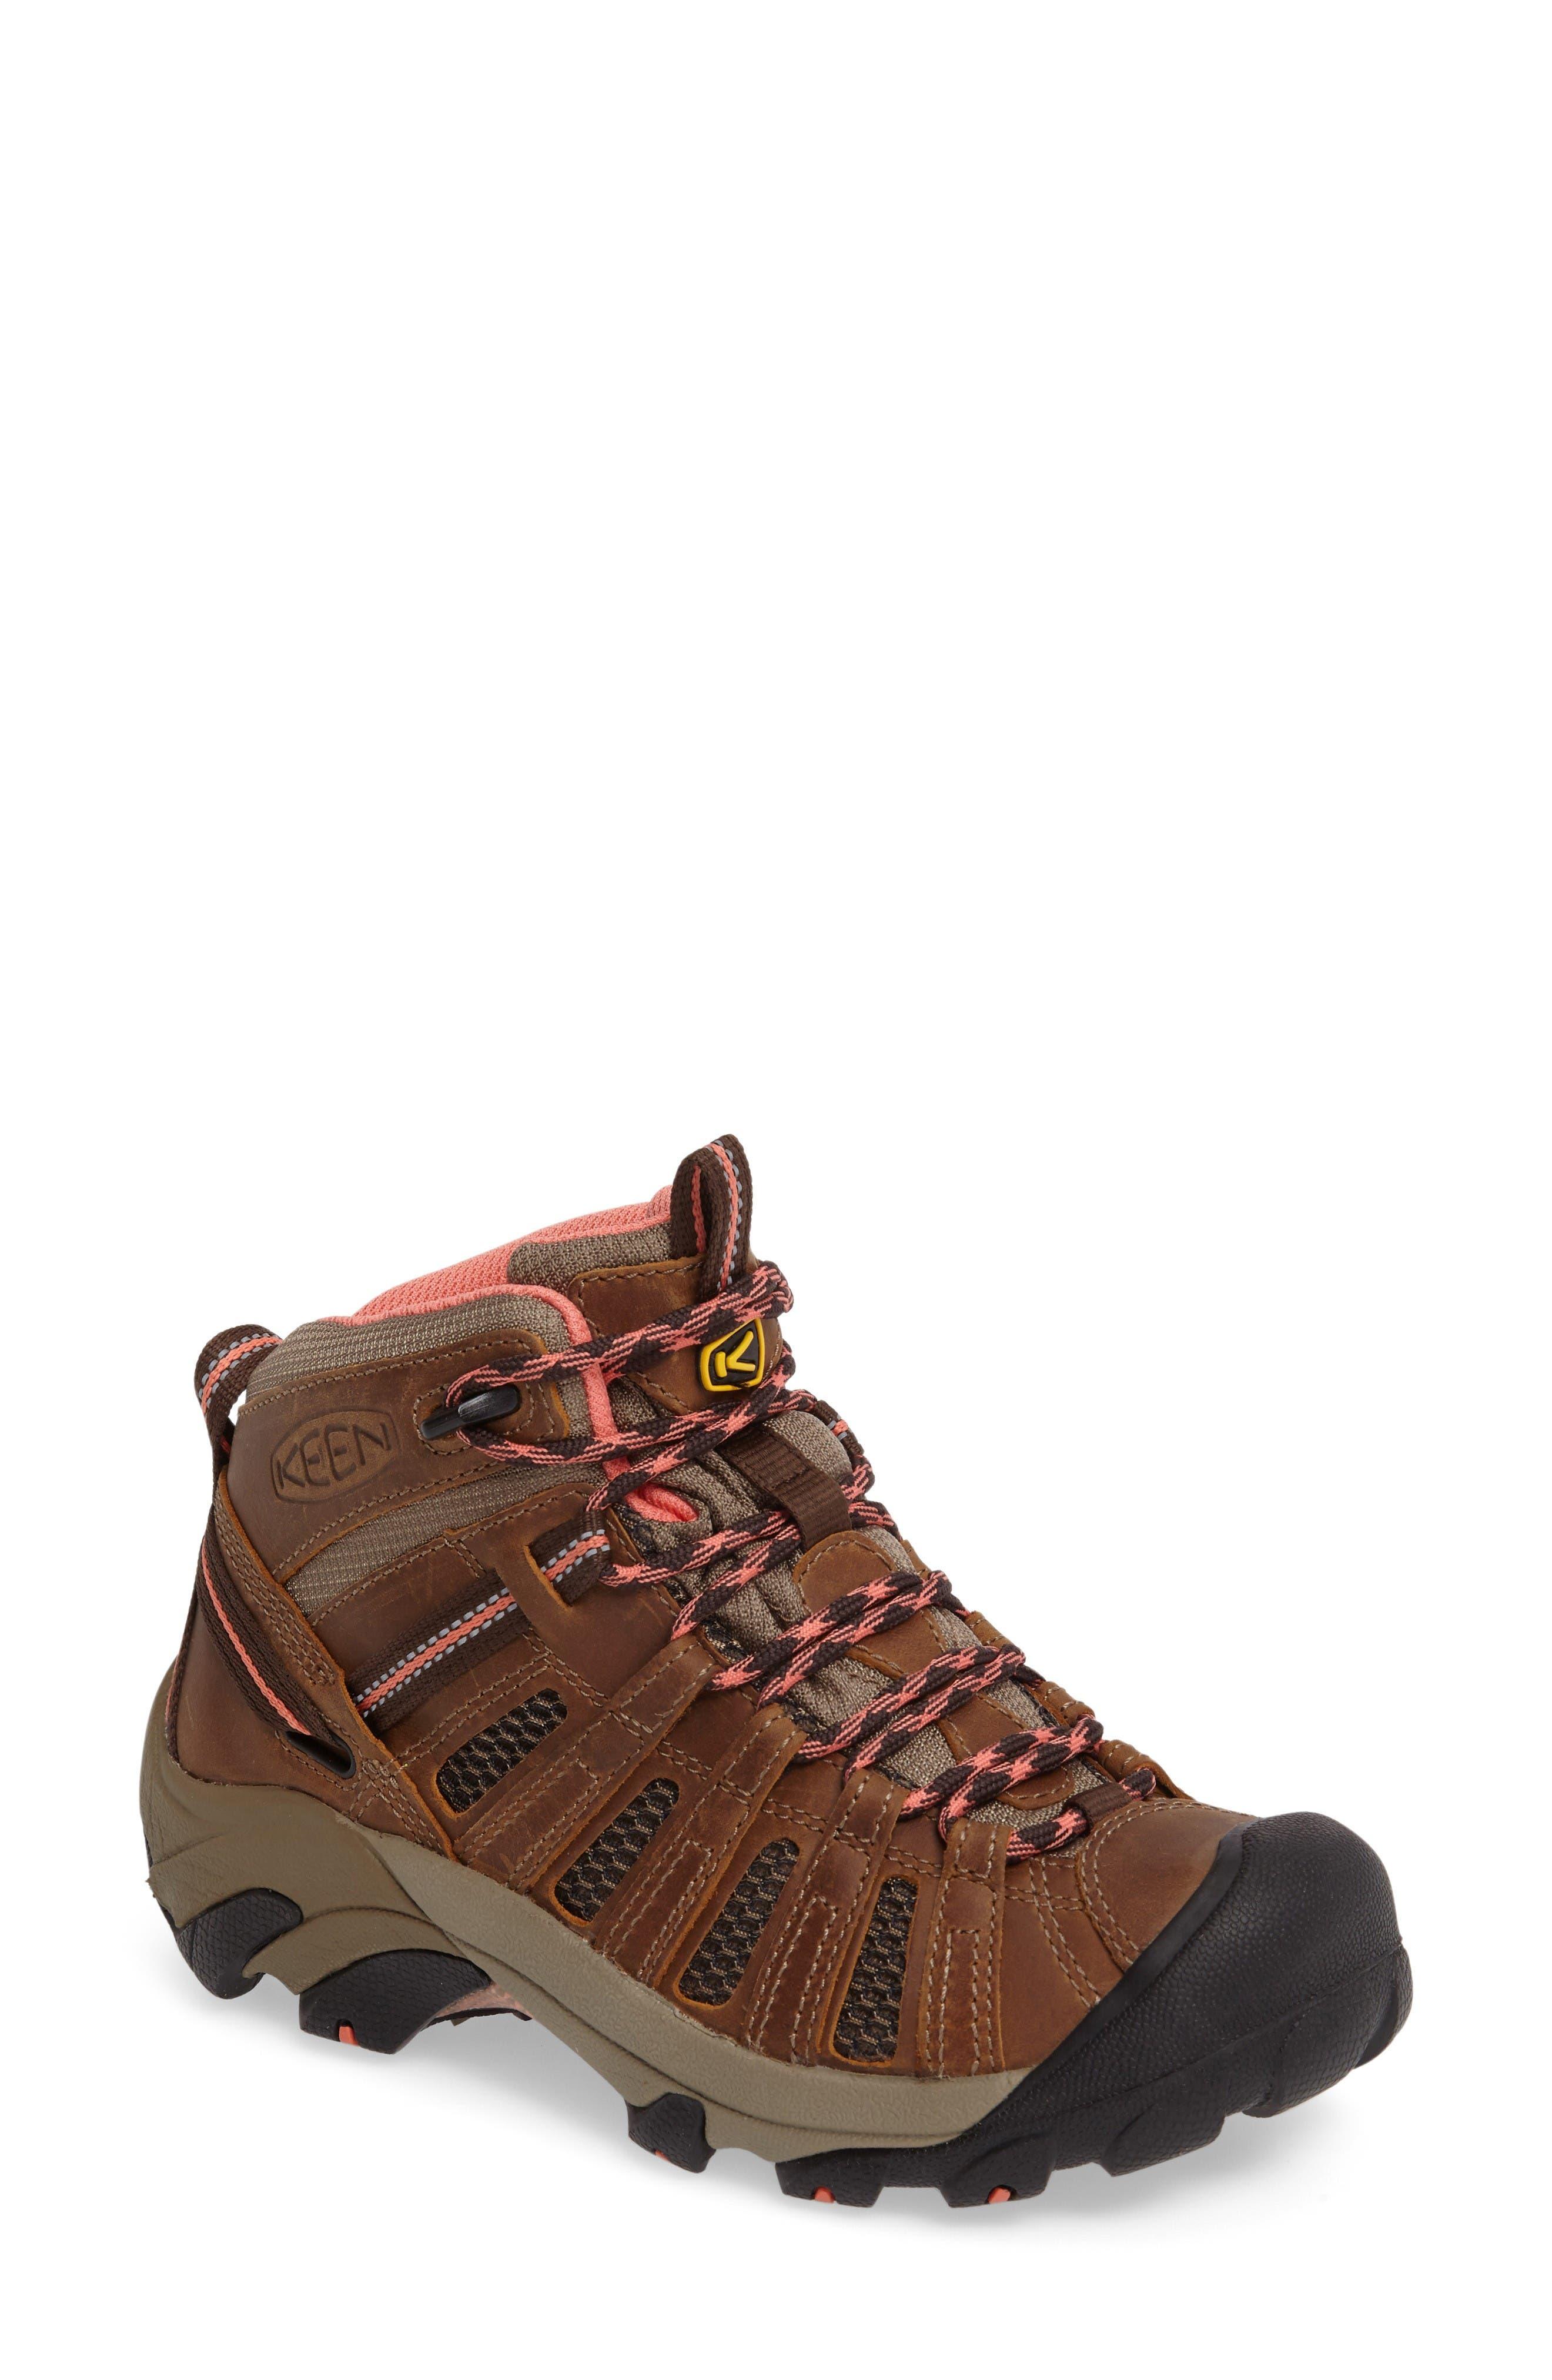 Alternate Image 1 Selected - Keen 'Voyageur Mid' Trail Shoe (Women)